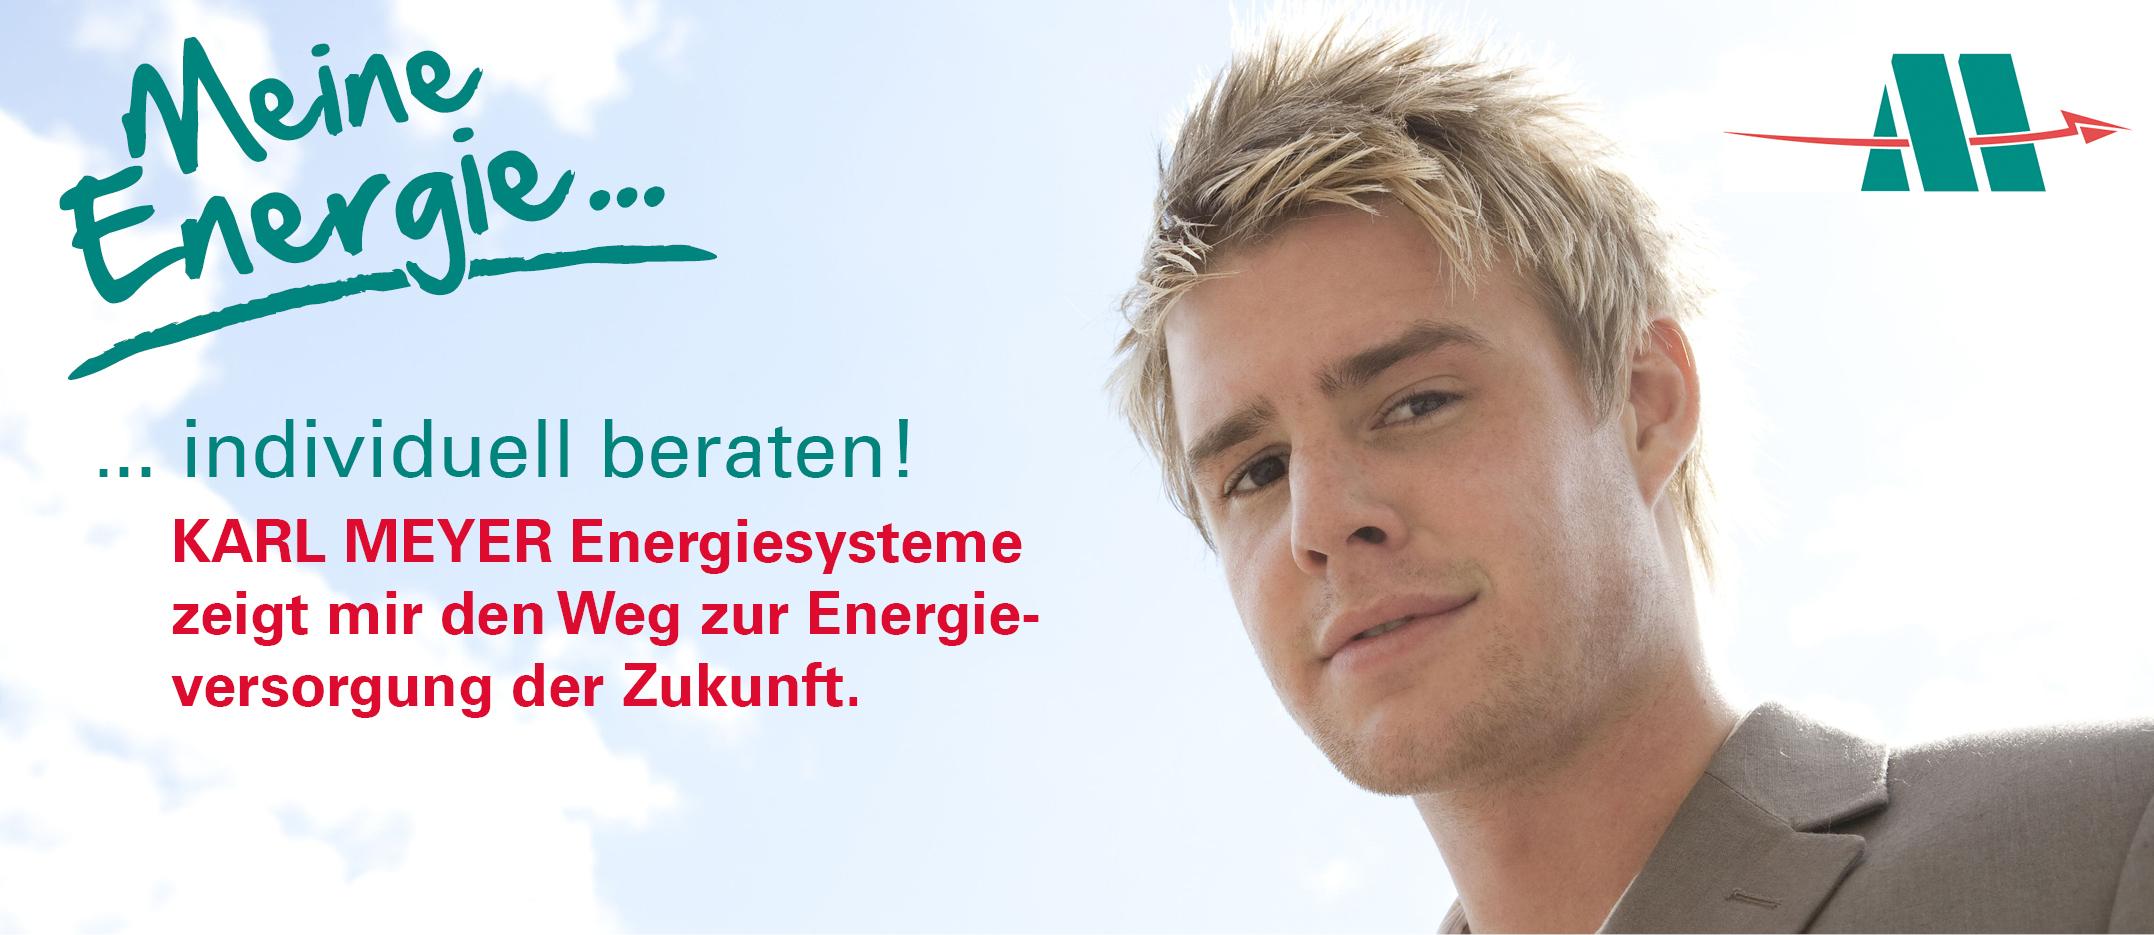 Karl Meyer Energiesysteme: Individuelle Beratung